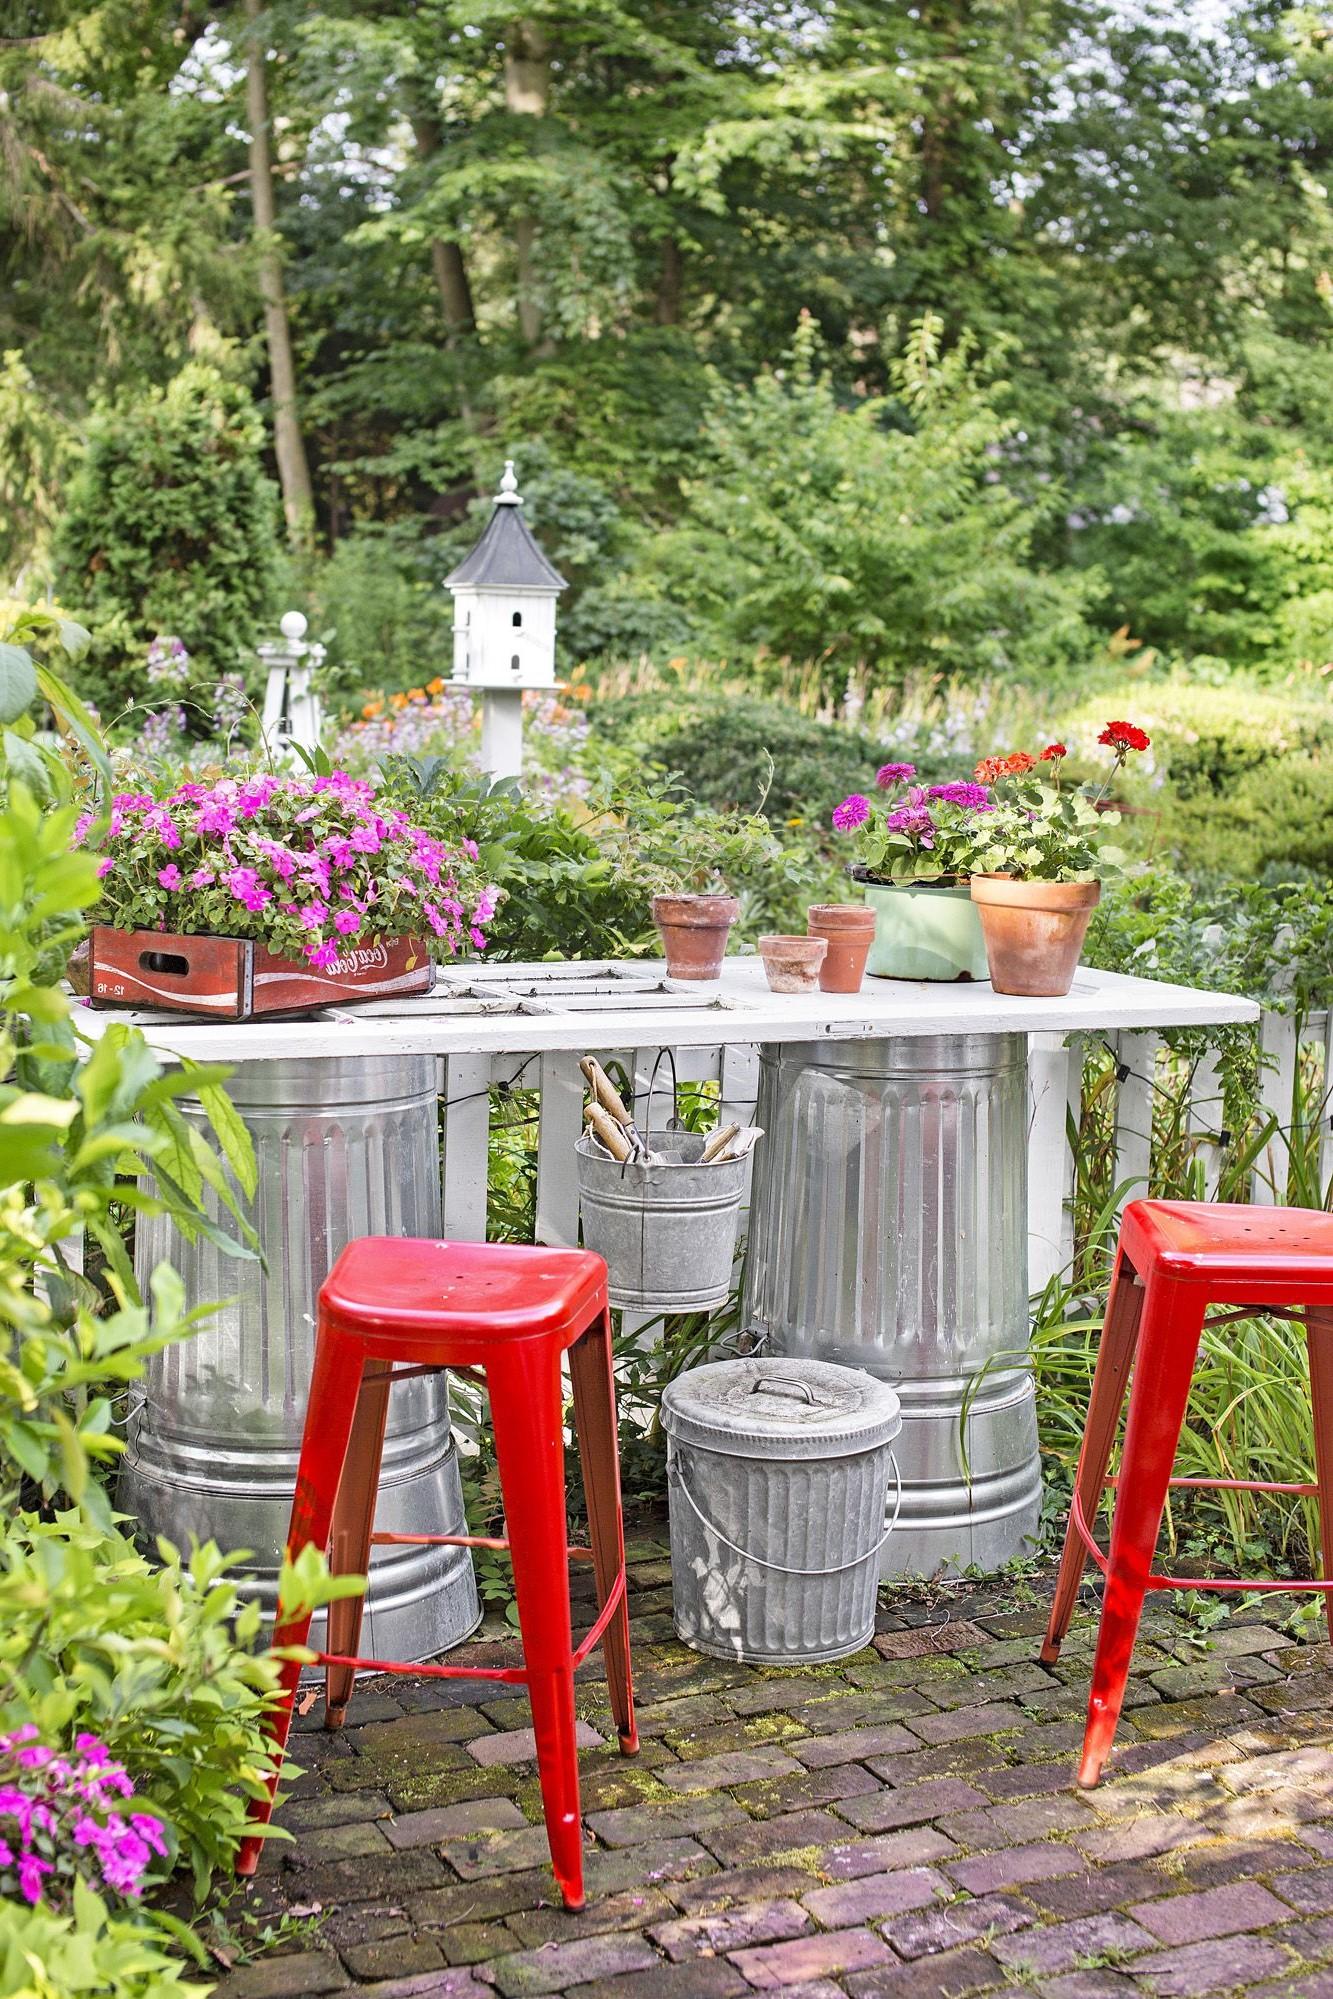 Bricolage de jardin: Station d'empotage facile.